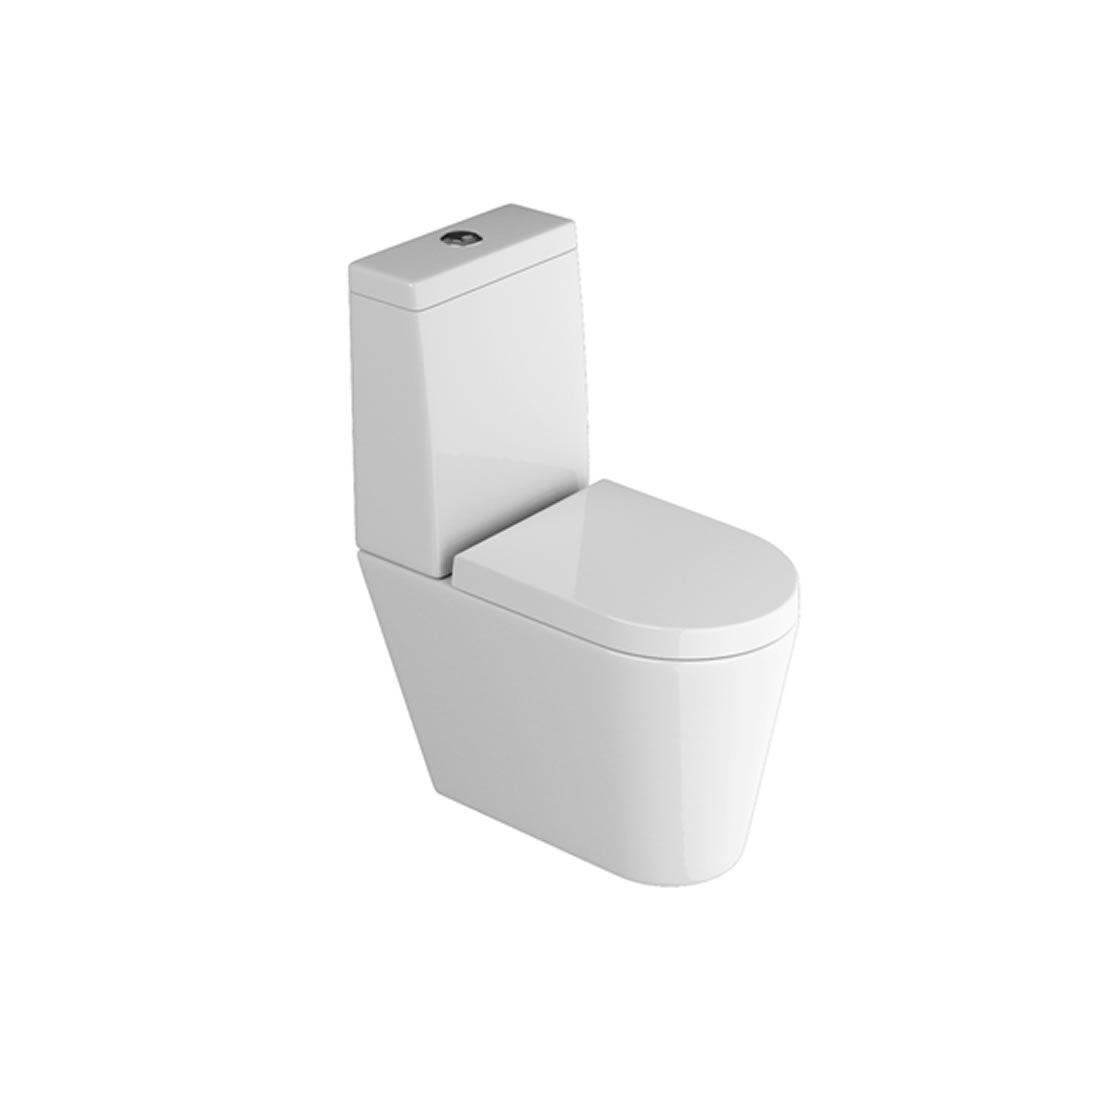 Kit Vaso Sanitário com Caixa Acoplada 3/6L Ecoflush Link Branco Deca